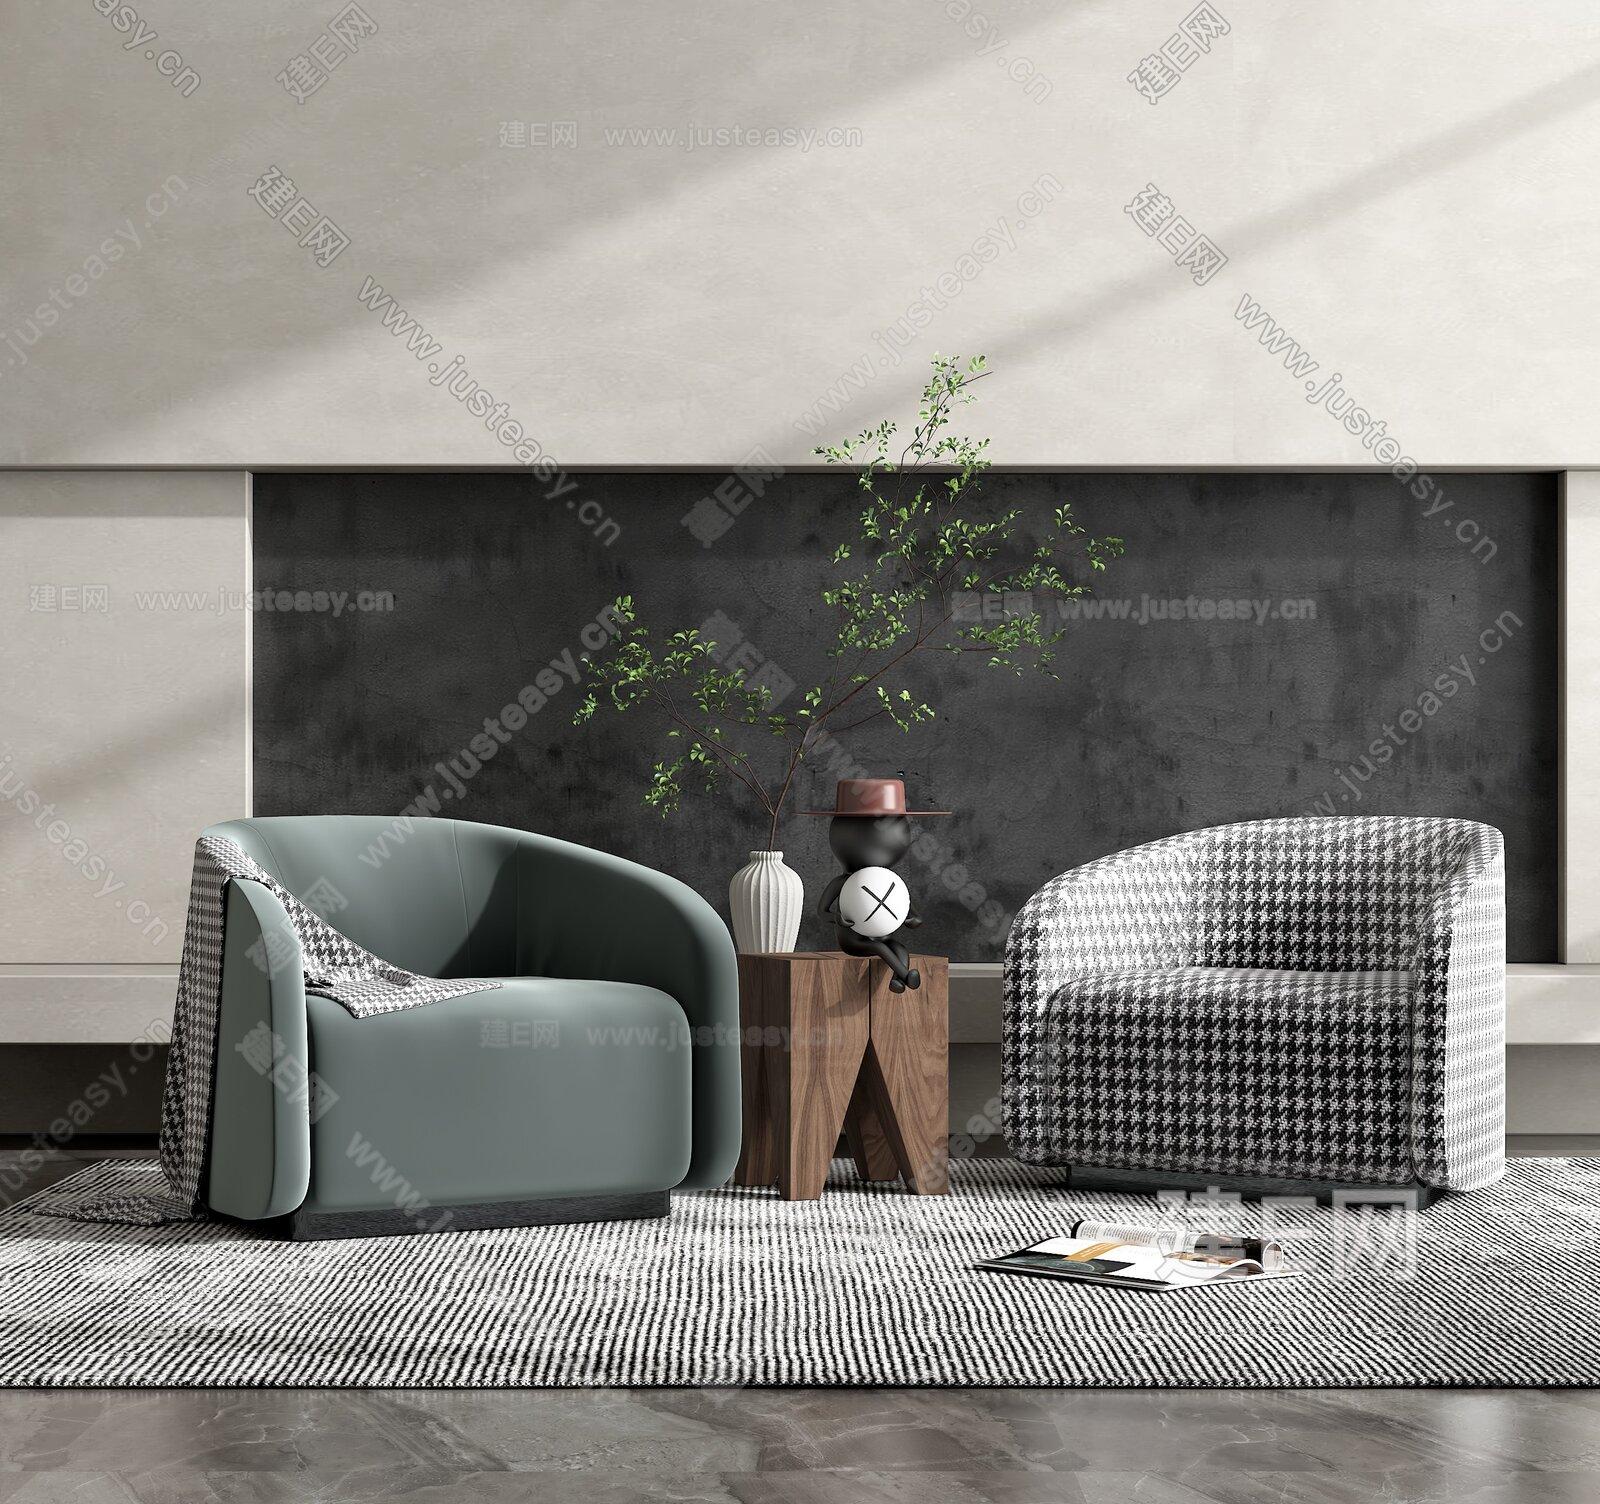 Fendi 现代单人沙发组合3d模型